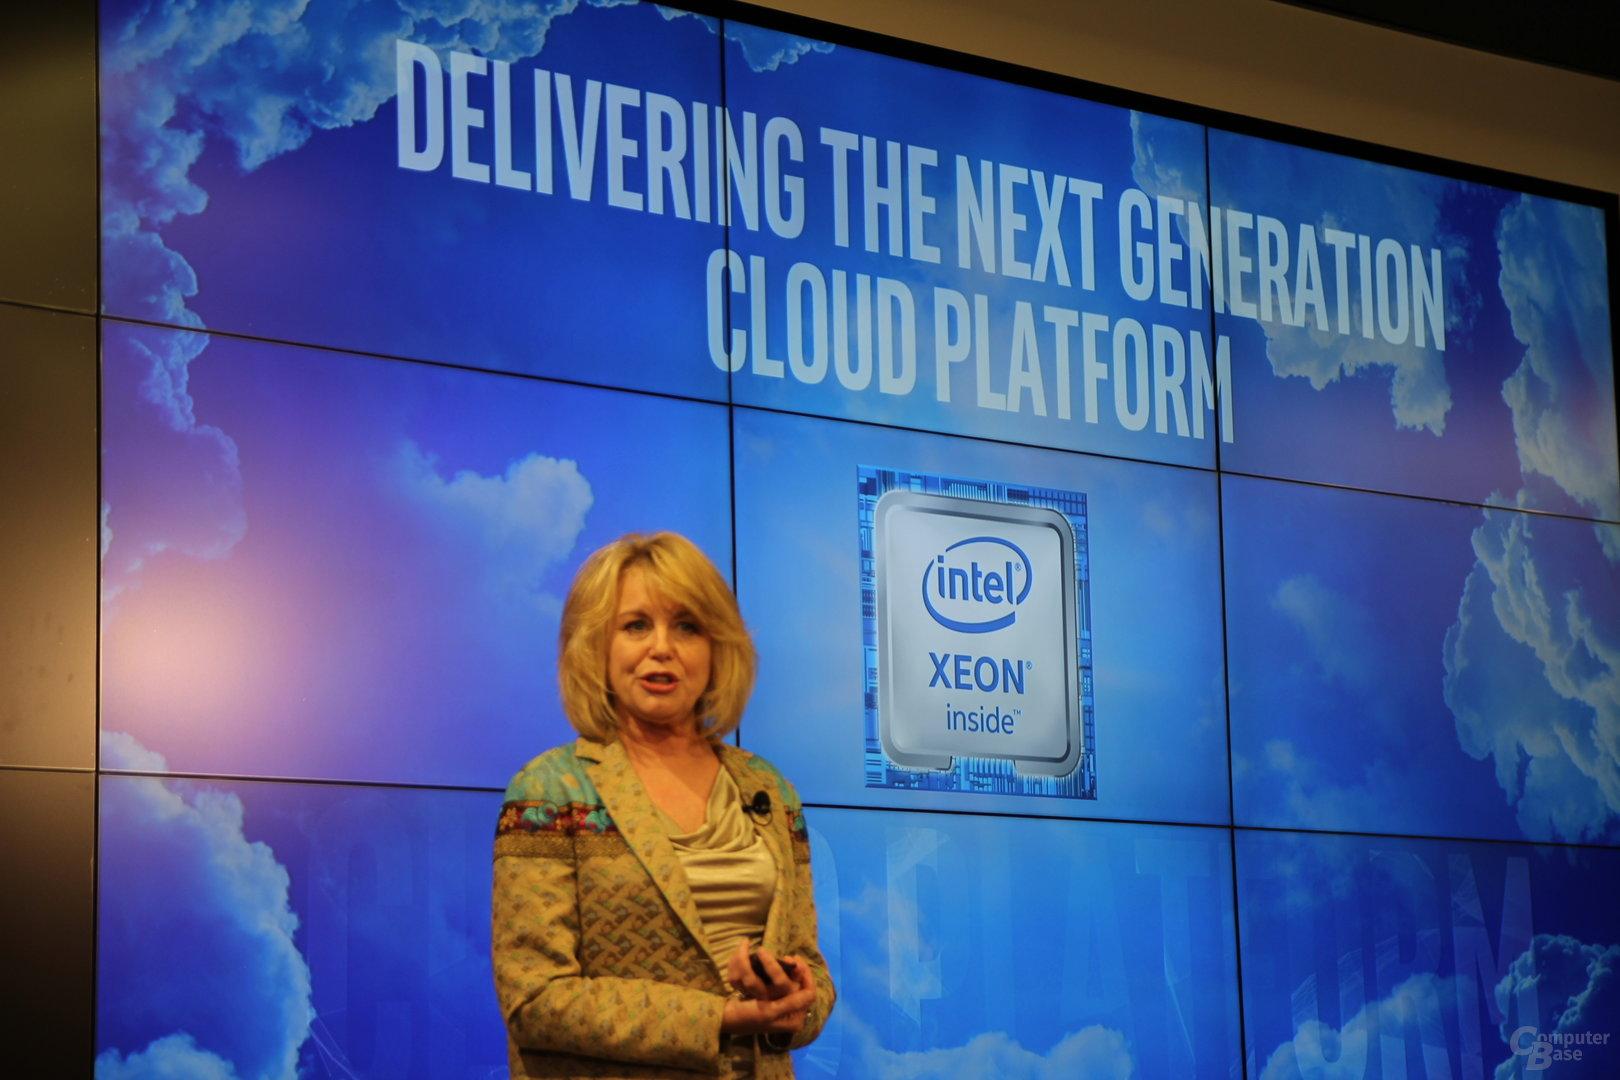 Intels DCG-Chefin Diane Bryant enthüllt Xeon E5-2600 v4